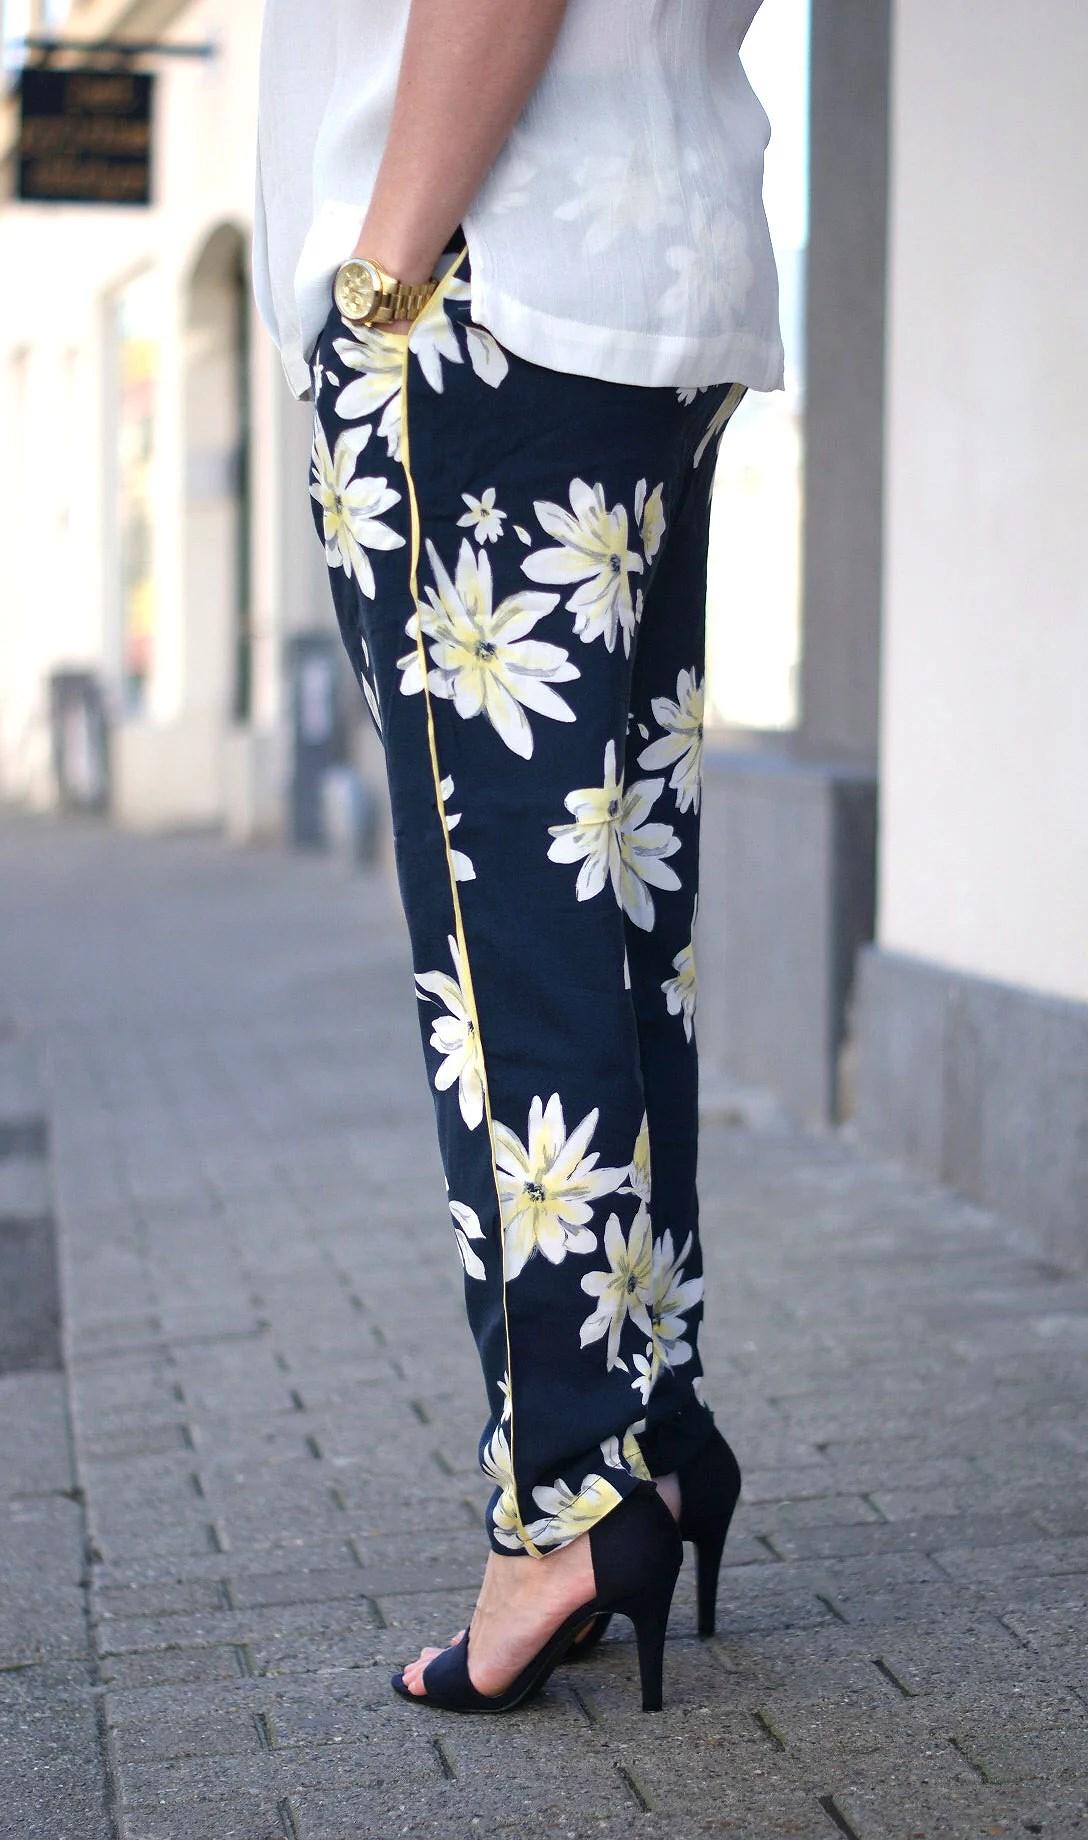 It's My Passions, Modeblogger, Tilbageblik, 2015, Julie Mænnchen, Modeblogger, Dansk modeblogger, Aalborg modeblog